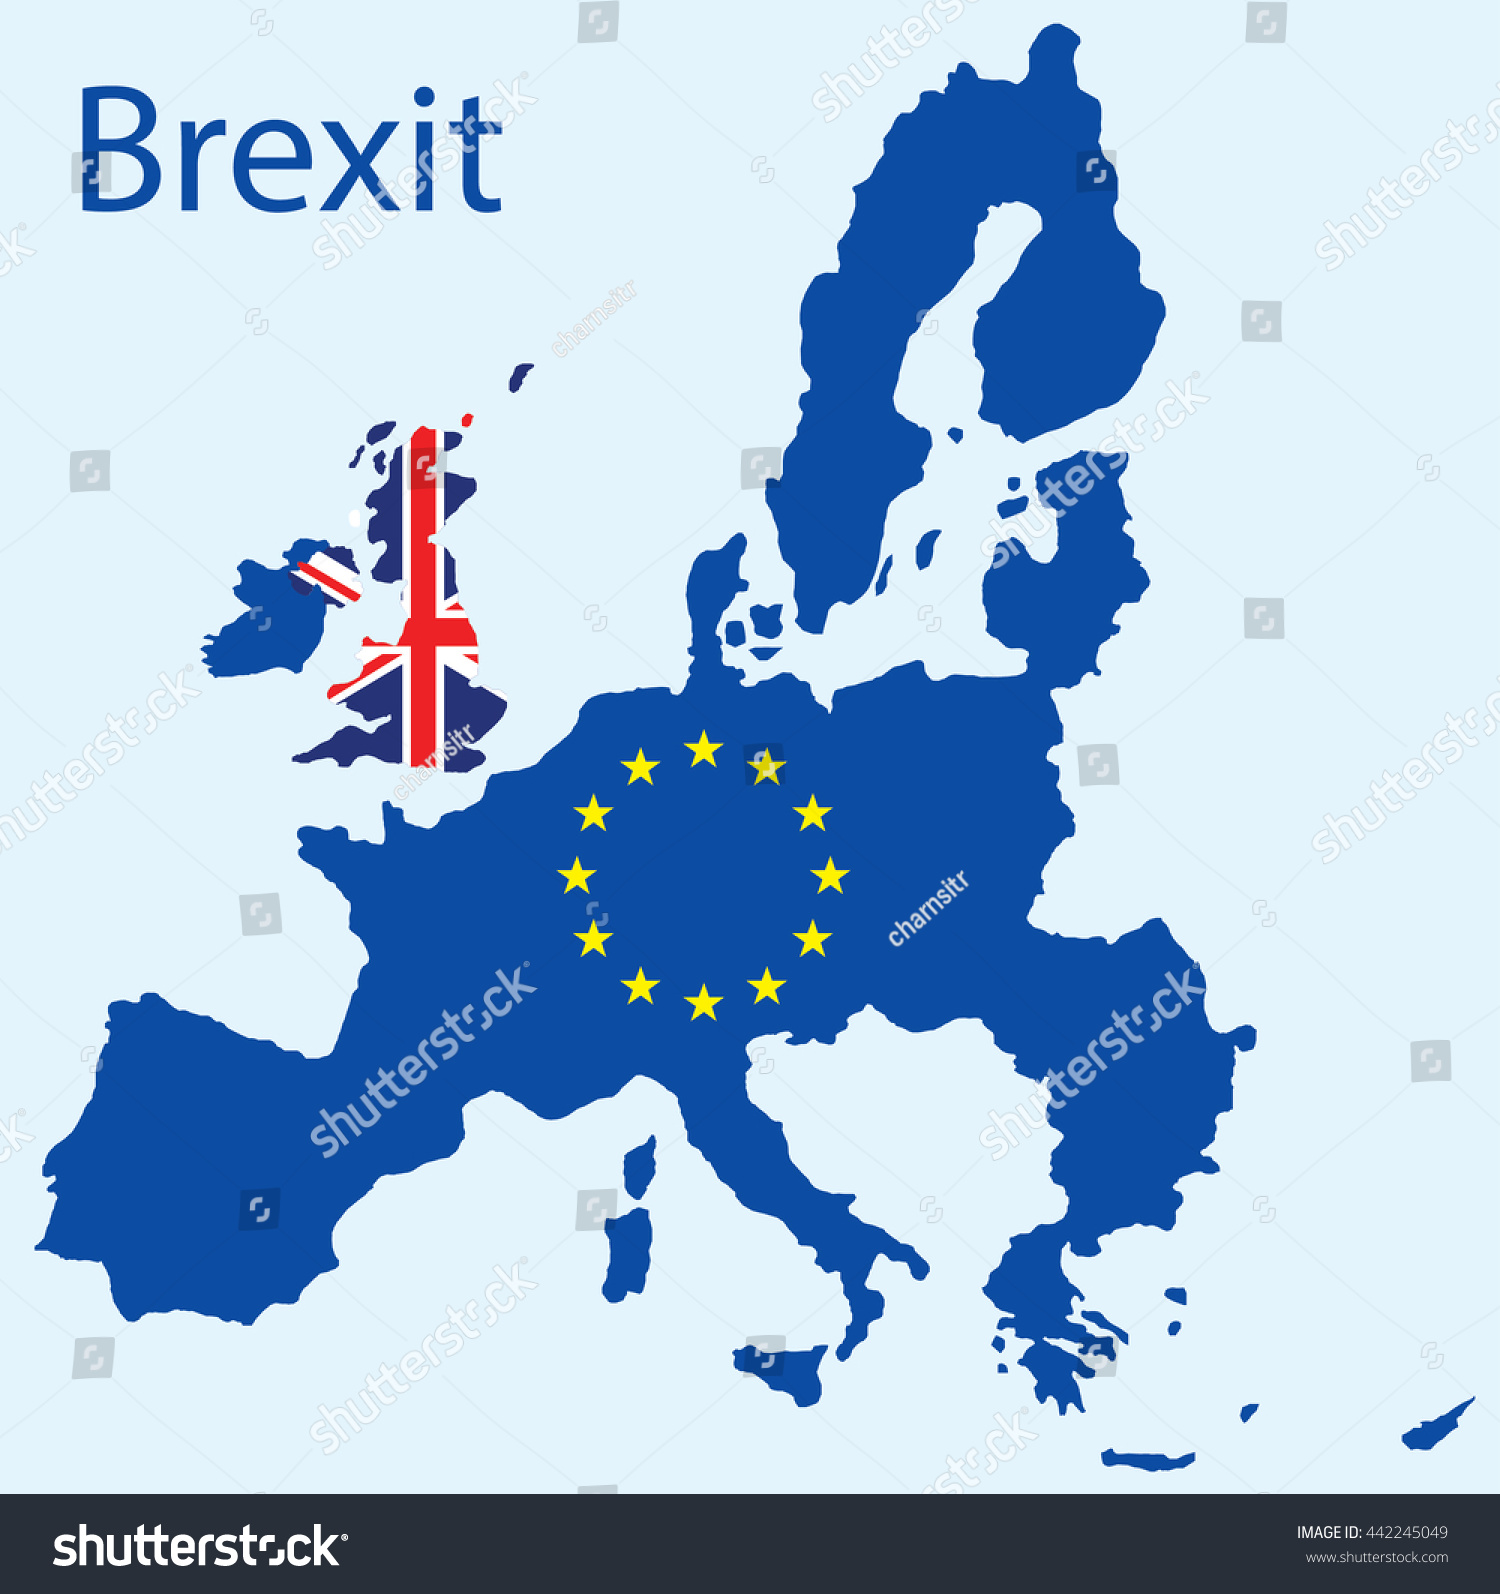 vector map uk leaving eu brexit stock vector 442245049 shutterstock. Black Bedroom Furniture Sets. Home Design Ideas